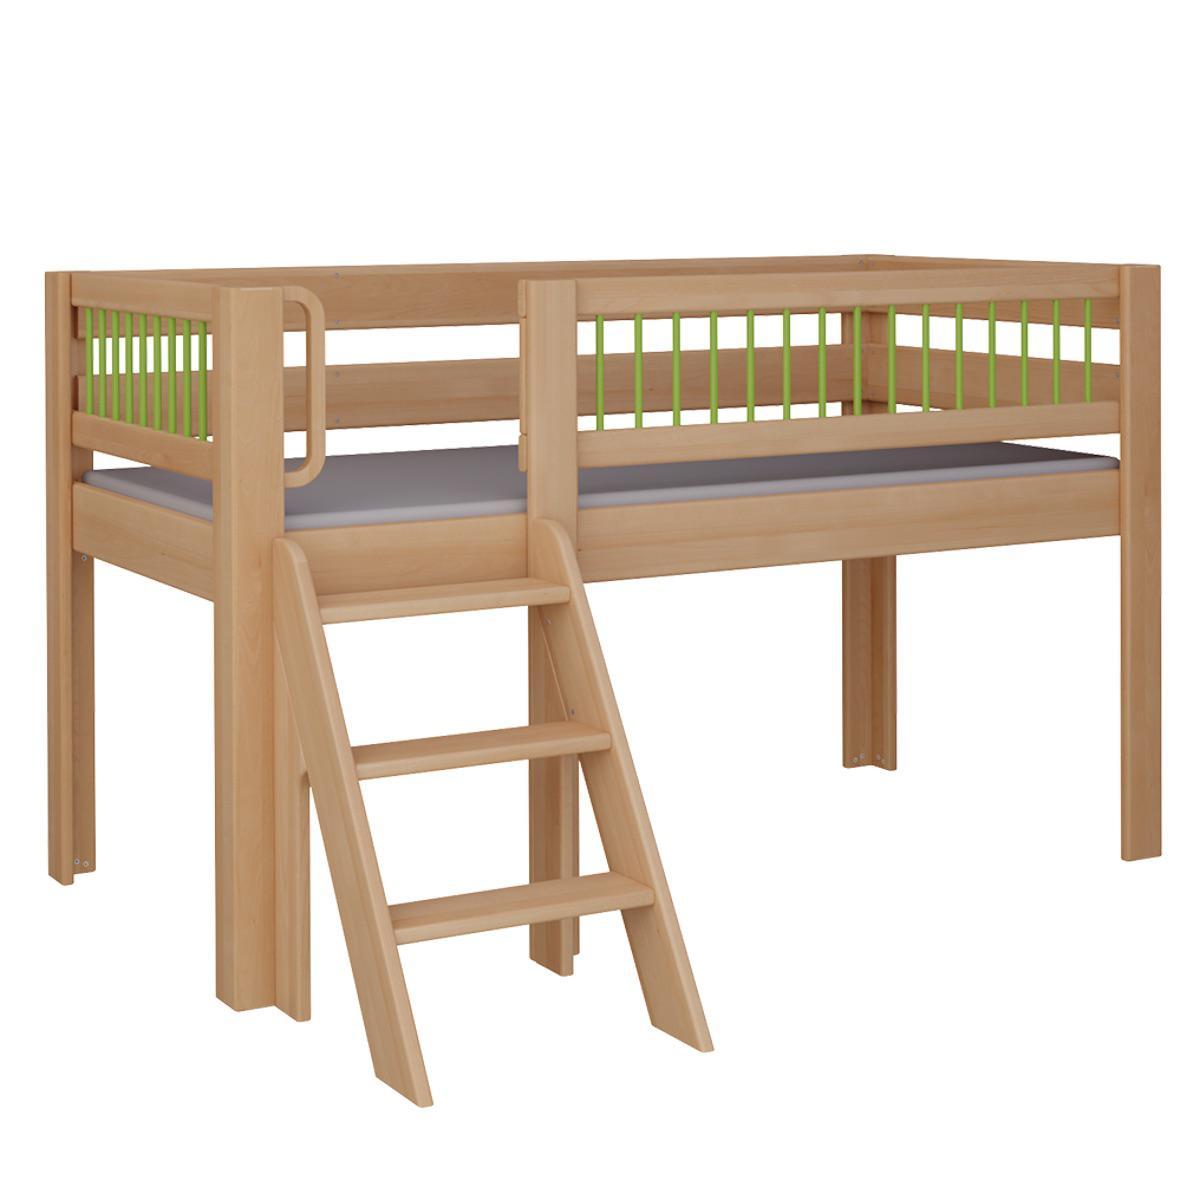 Kubu halbhohes Spielbett mit Treppe DELUXE De Breuyn natur geölt Rundstäbr grün